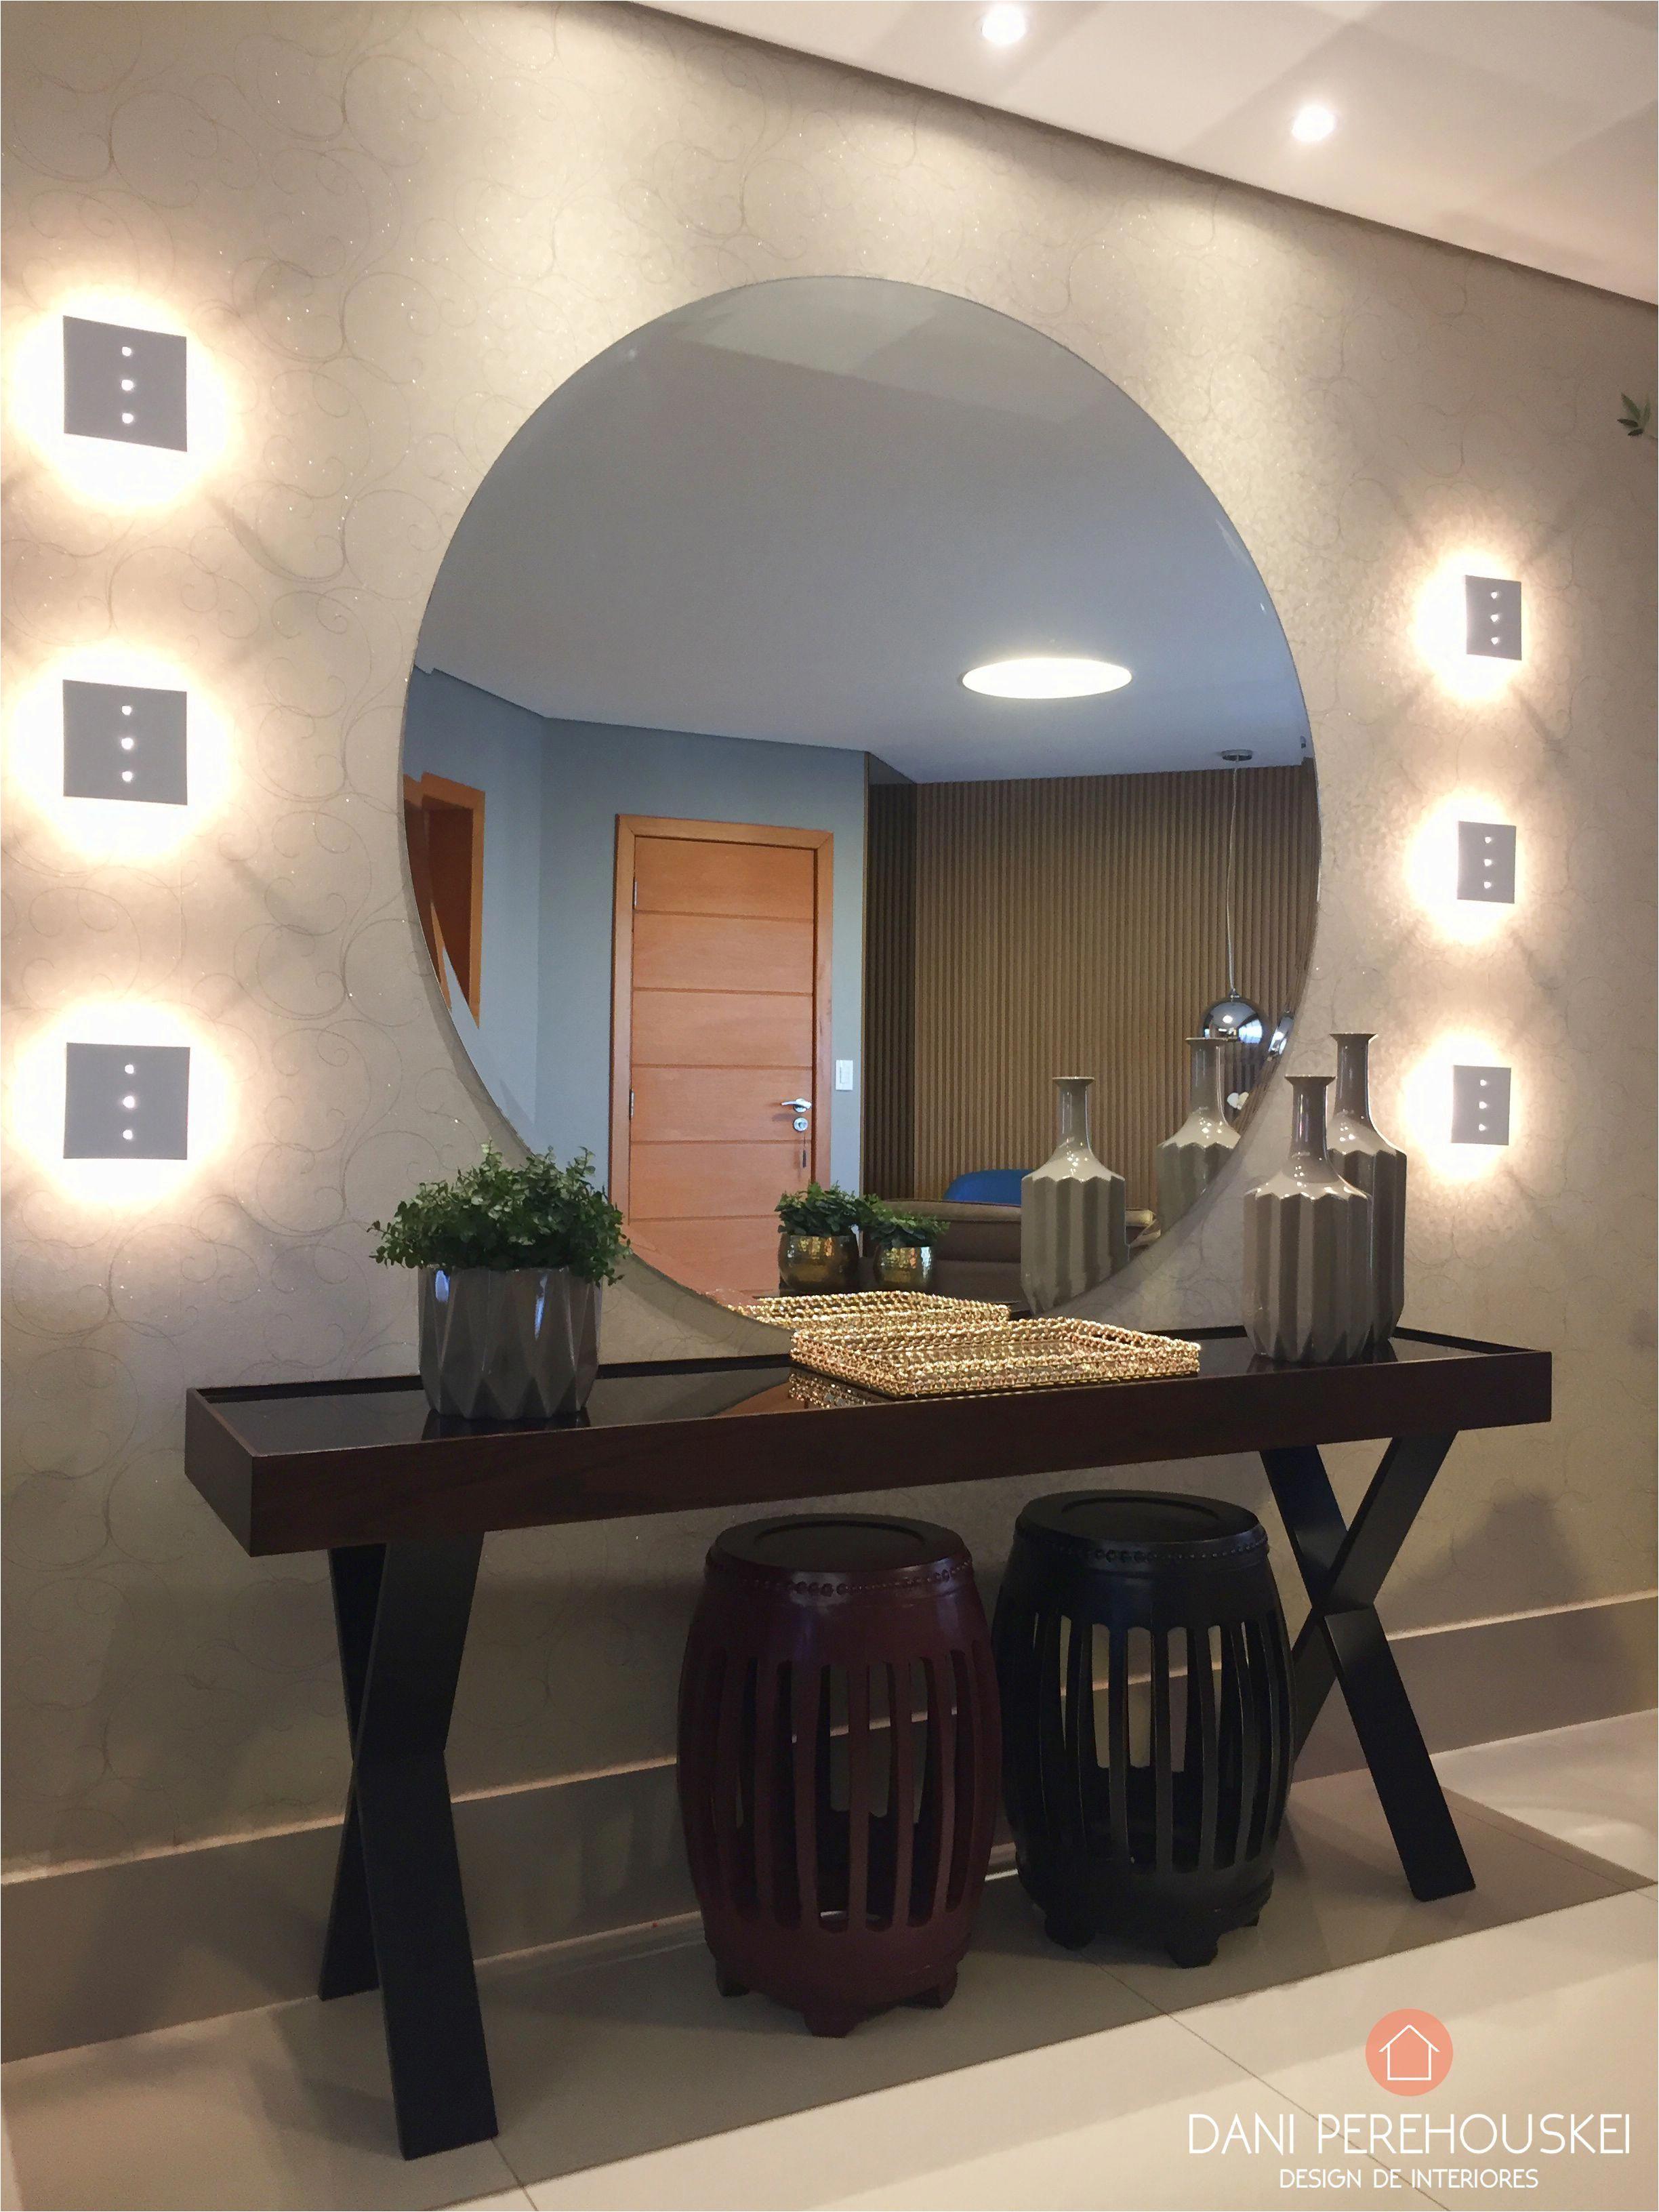 aparador sala de jantar by dani perehouskei designer de interiores danipinteriores design